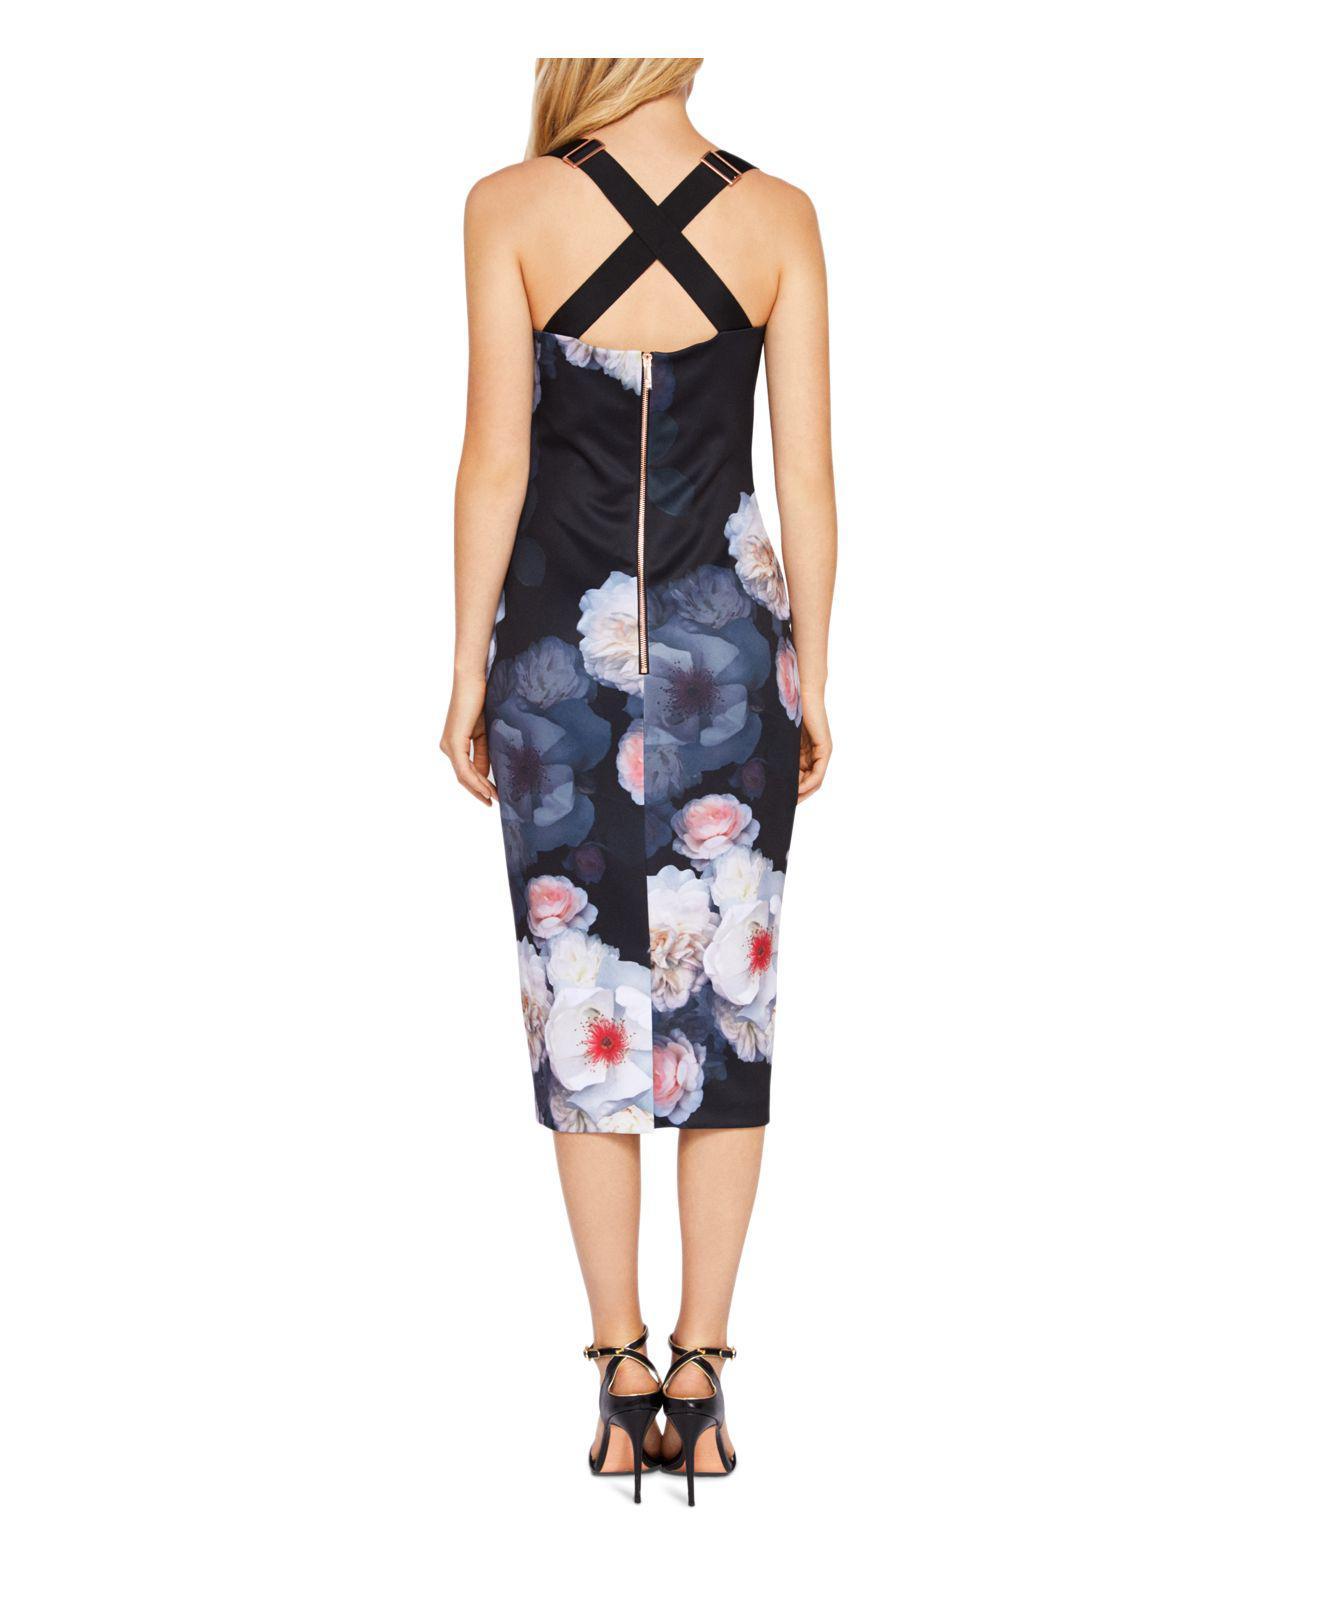 2adadd98cafd85 Lyst - Ted Baker Teeki Chelsea Print Body-con Dress in Black